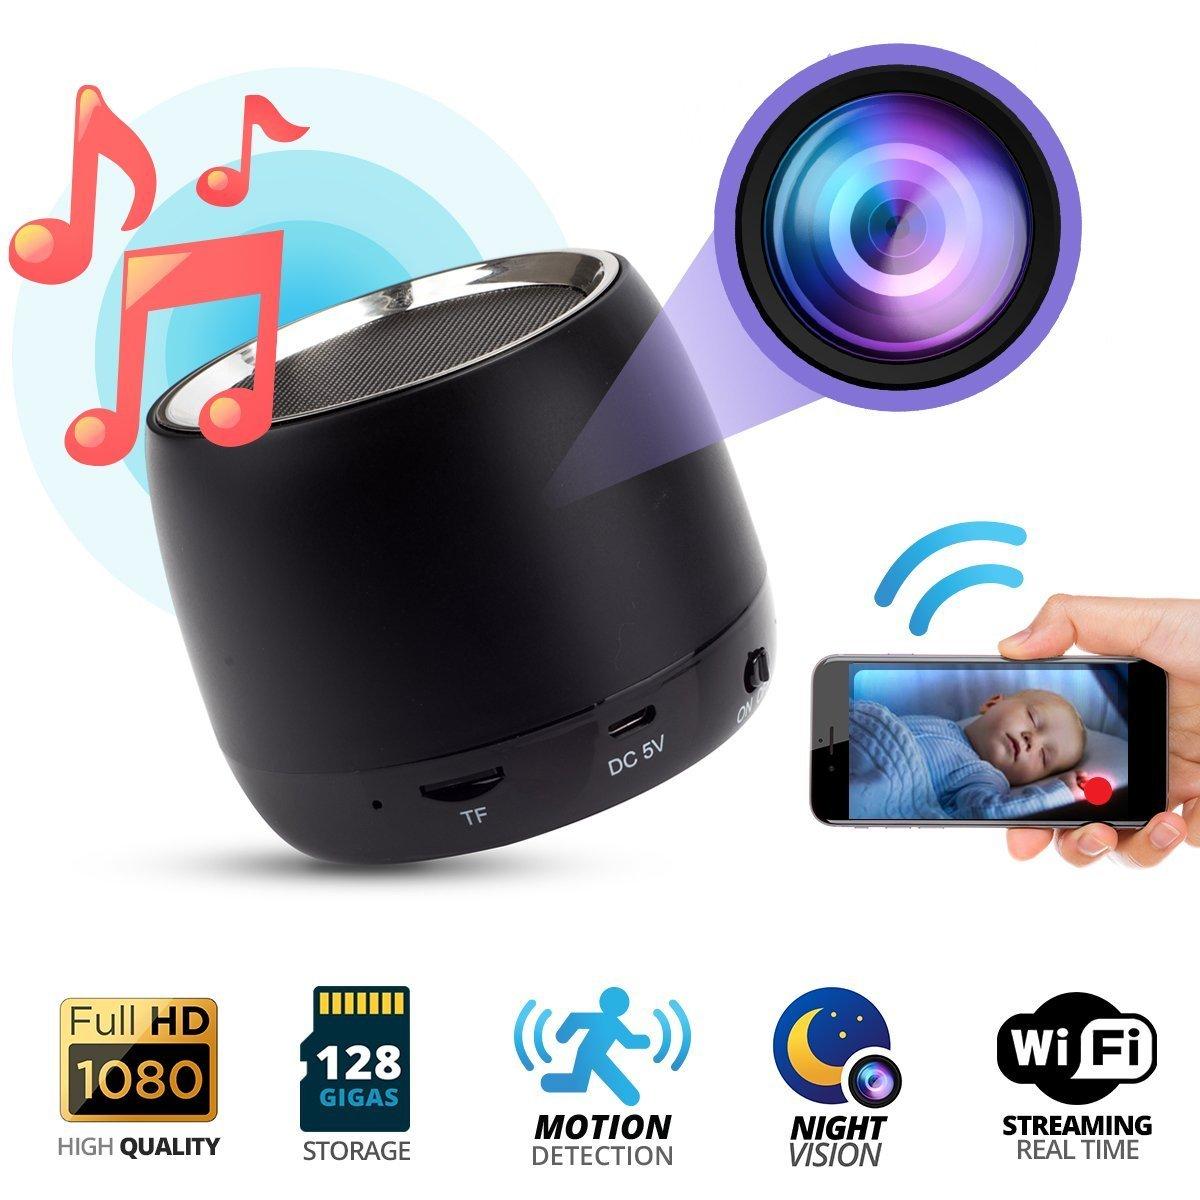 SilverSea™ 1080P HD高画質 P2P Wifi 隠しカメラ Bluetooth ワイヤレススピーカー型カメラ 長時間録画 防犯カメラ 4分割画面 スマホにリアルタイム監視 録音 動体検知 暗視機能 iPad/iPhone/Android 対応 遠隔監視操作 小型ビデオカメラ 大音量 重低音強化 長時間連続再生可能 最大128GB サポート 日本語取扱説明書付き B07CTGZ3M7